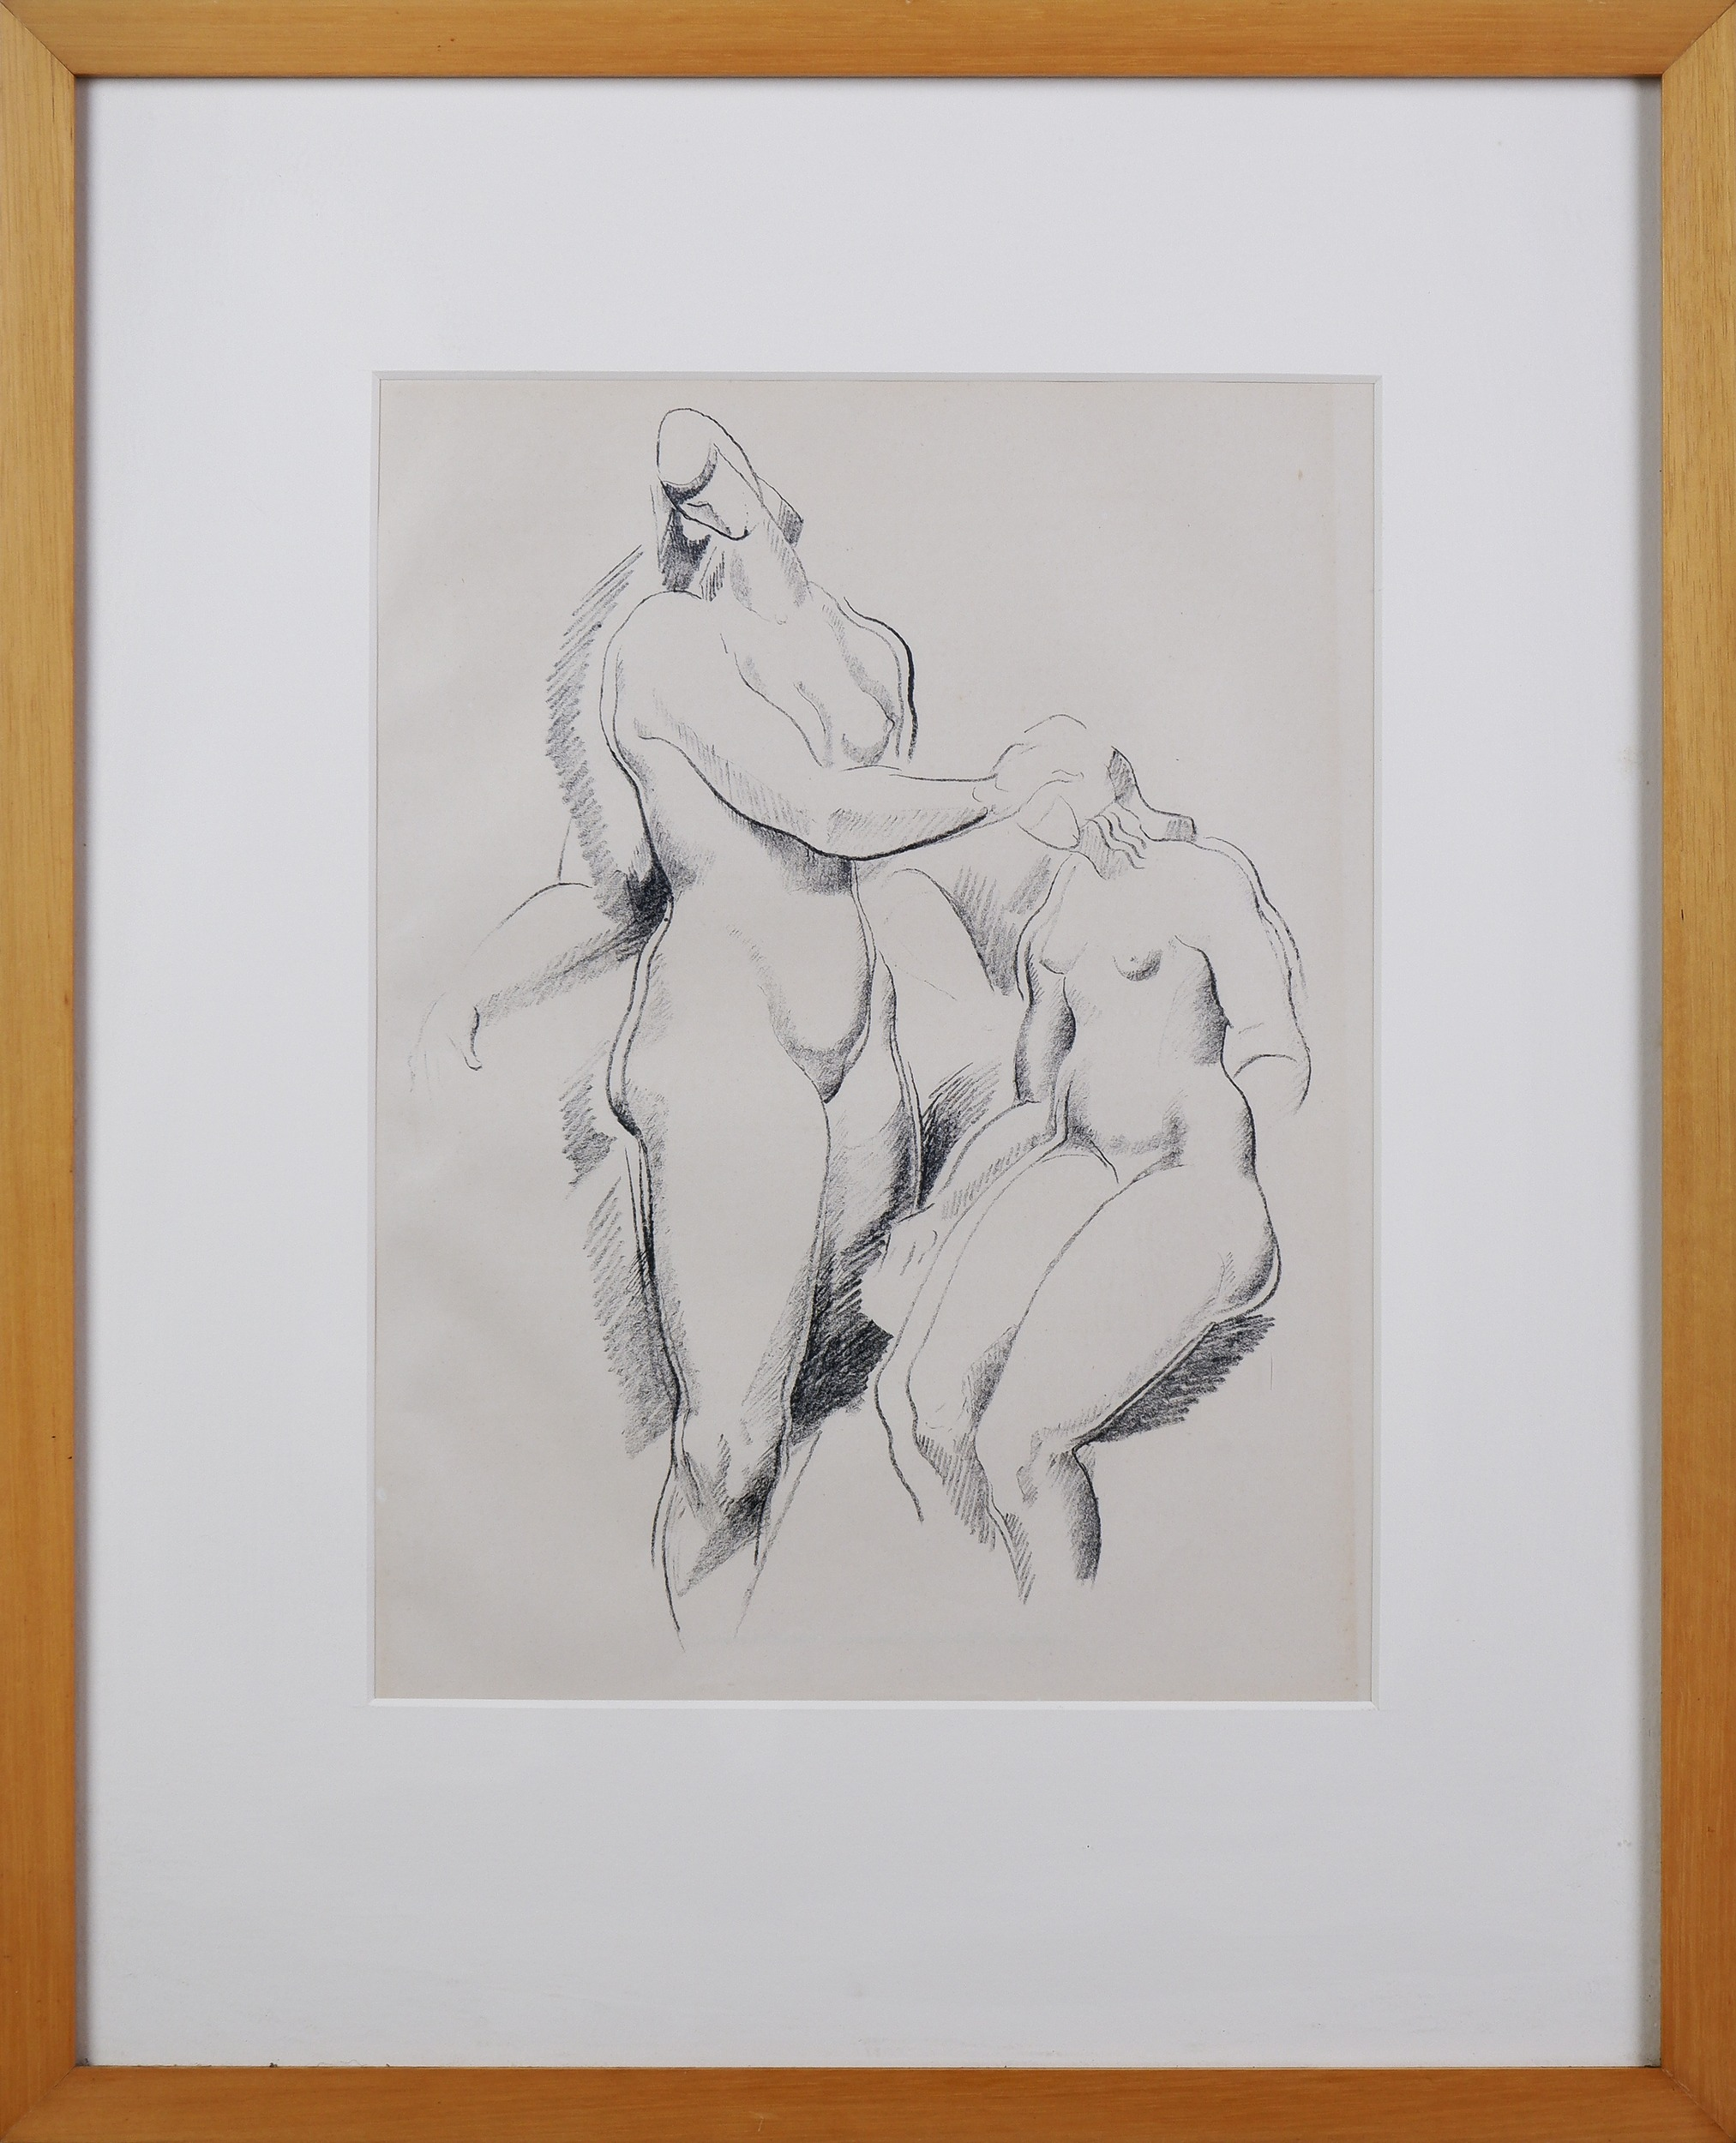 'Alexander Archipenko (1887-1964 Ukrainian/American), Figurliche Komposition c1920, Lithograph, 32.5 x 23 cm'